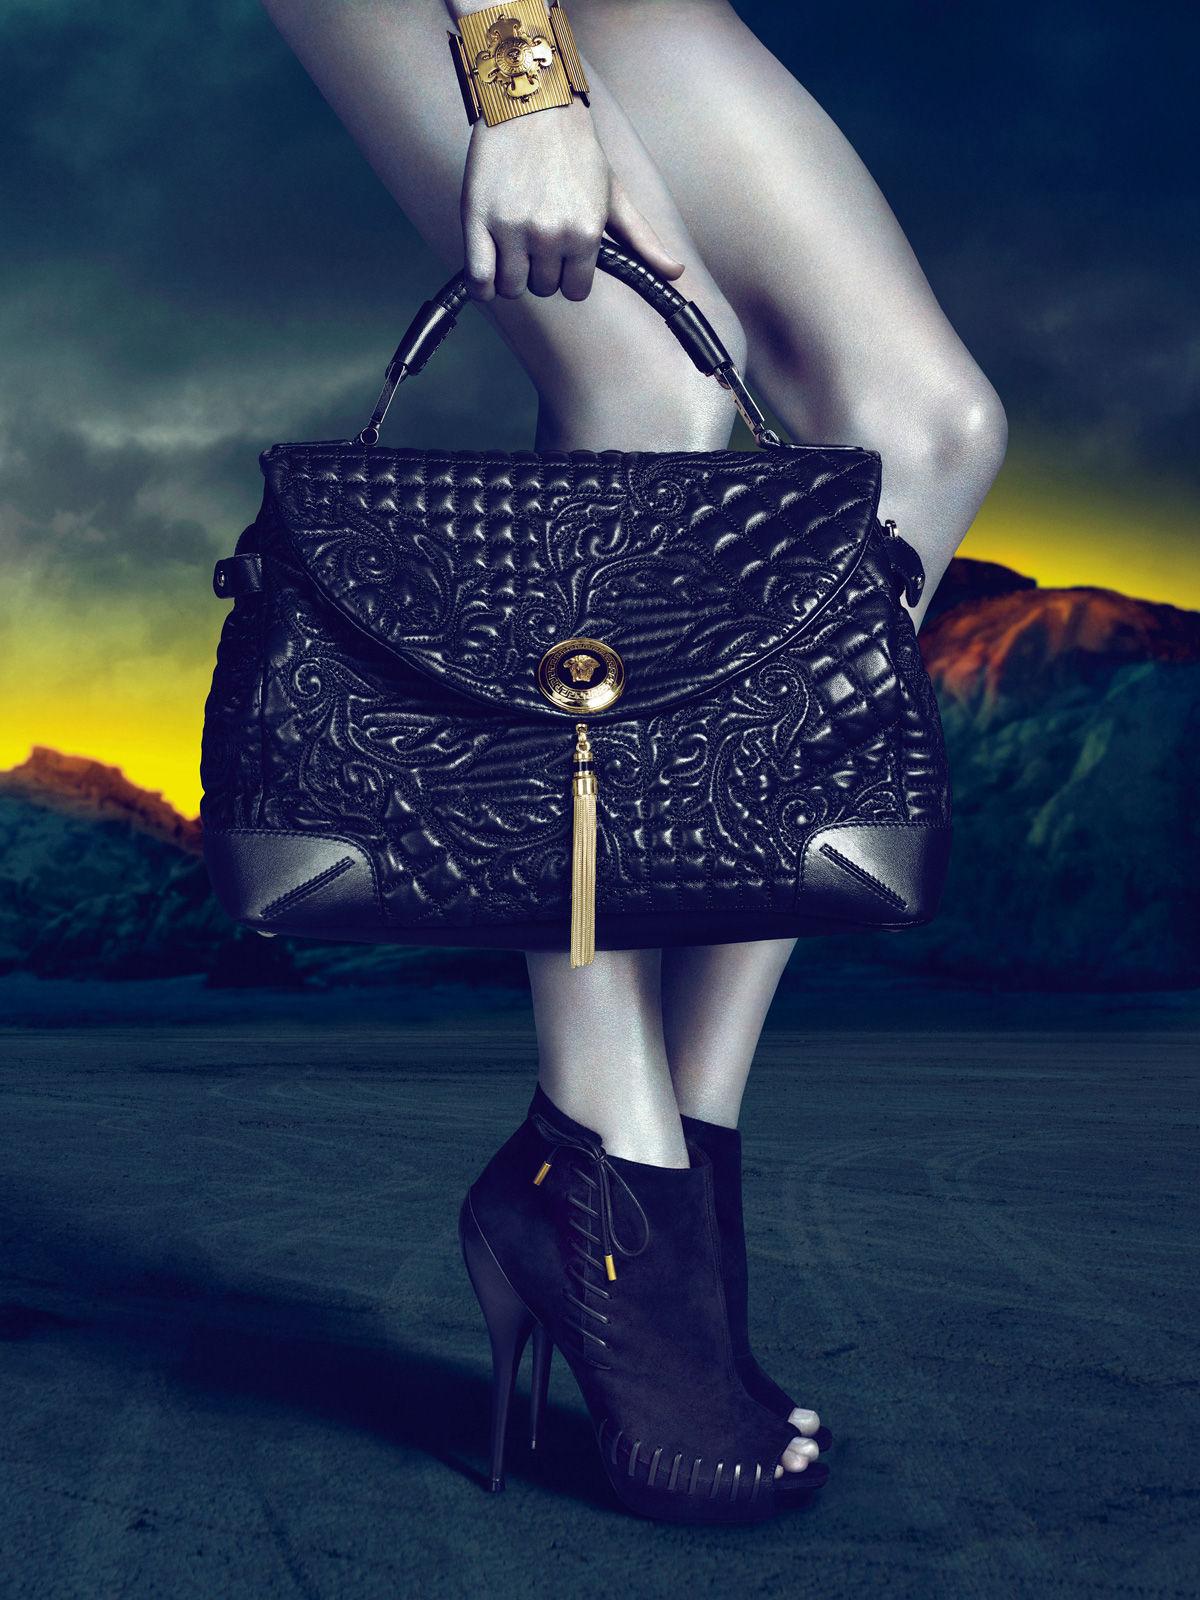 Versace Fall Winter 2011 Ad Campaign